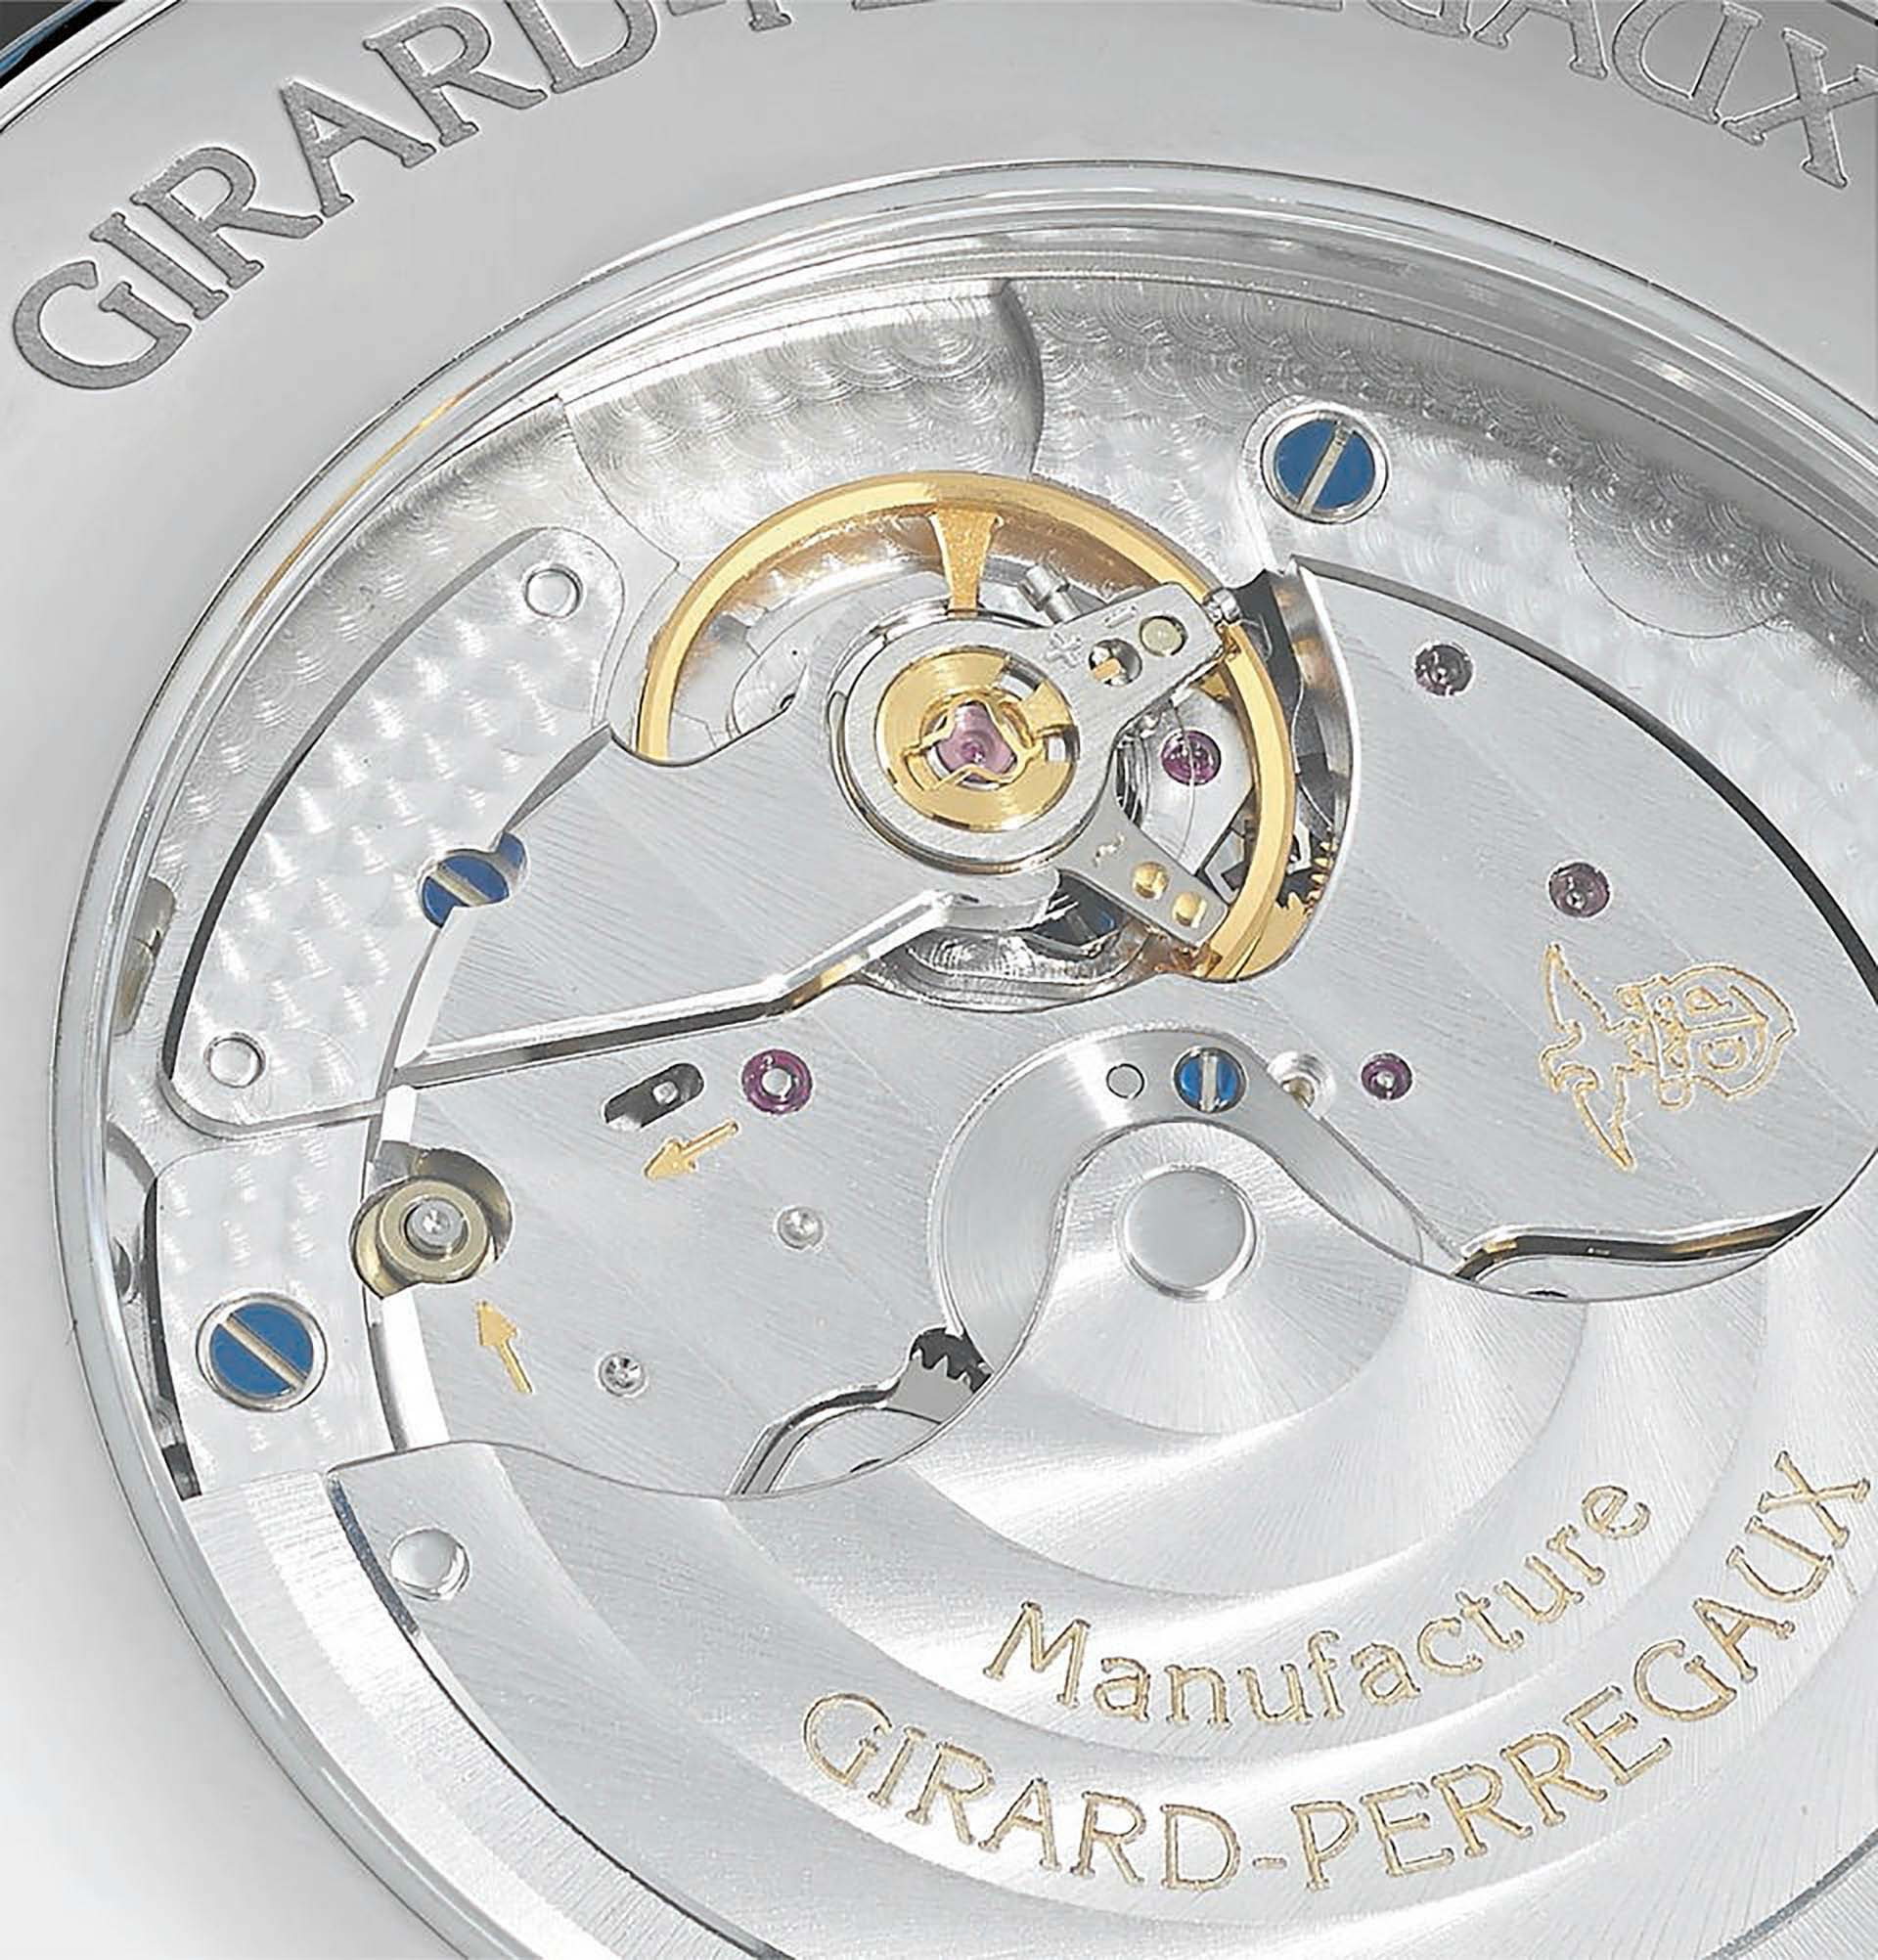 Girard-Perregaux Kaliber GP03300-0132